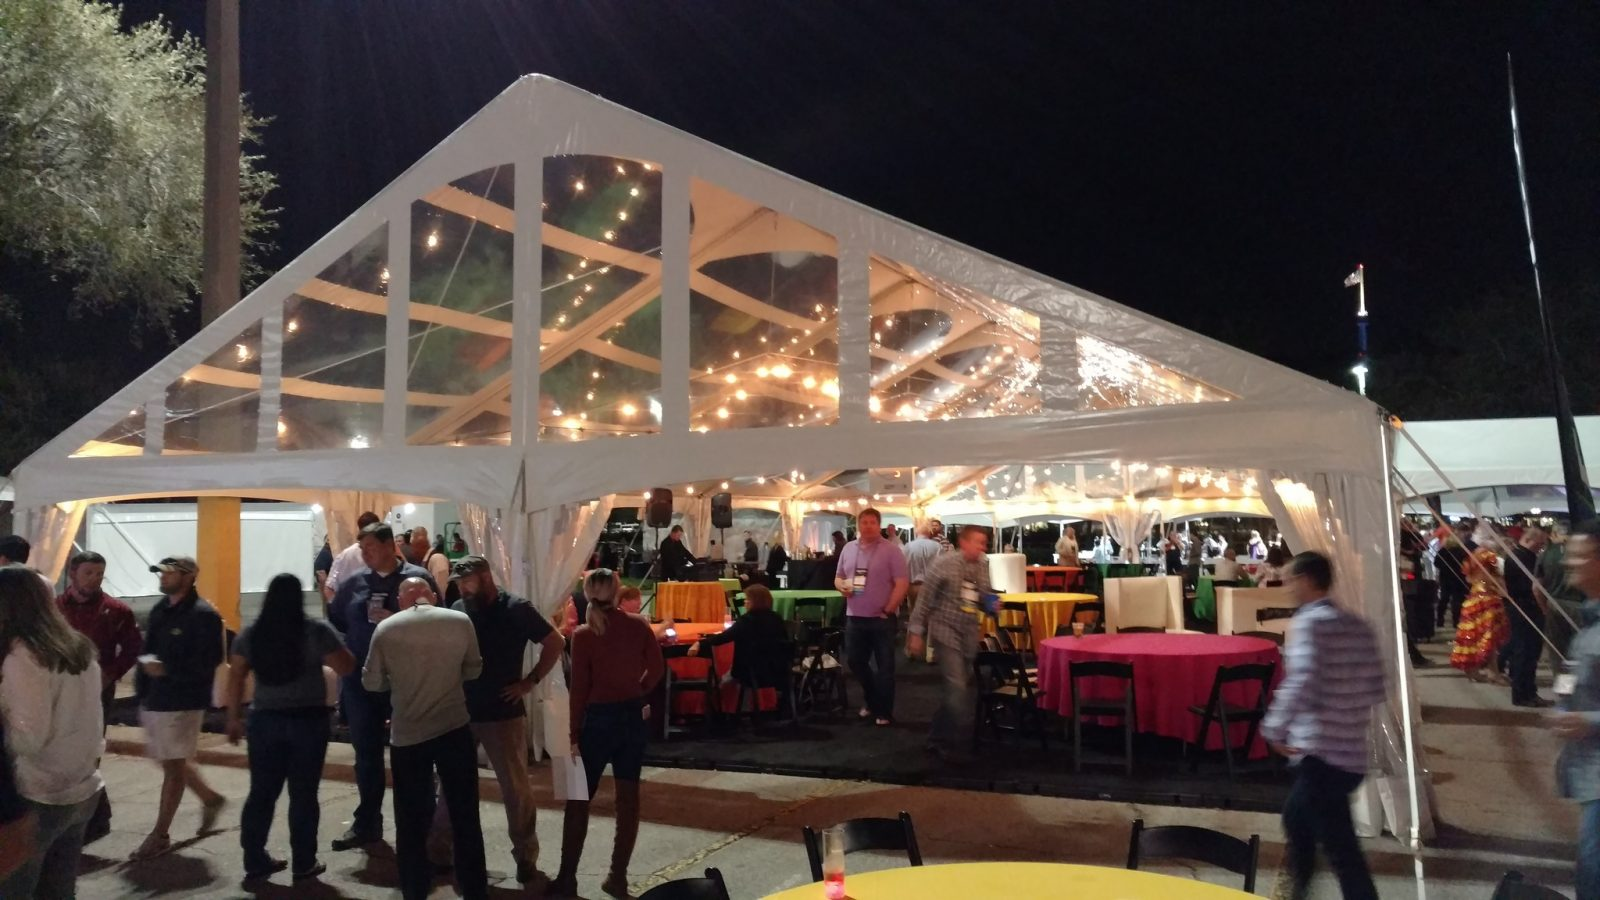 Tent Rental Customer Reveiws